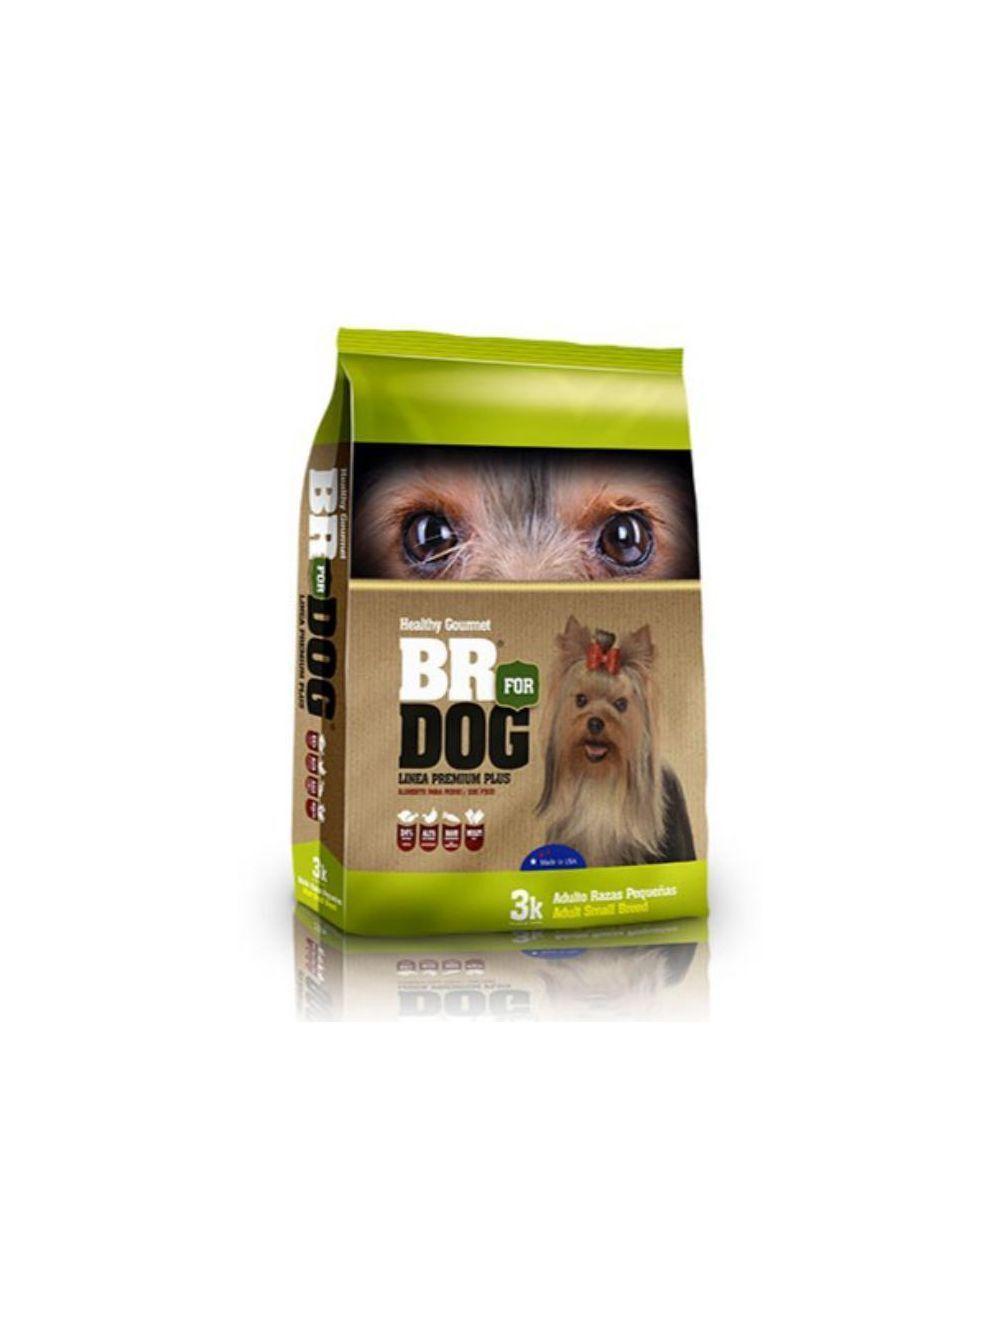 Br For Dog Adulto Raza Pequeña 3 Kg - Ciudaddemascotas.com